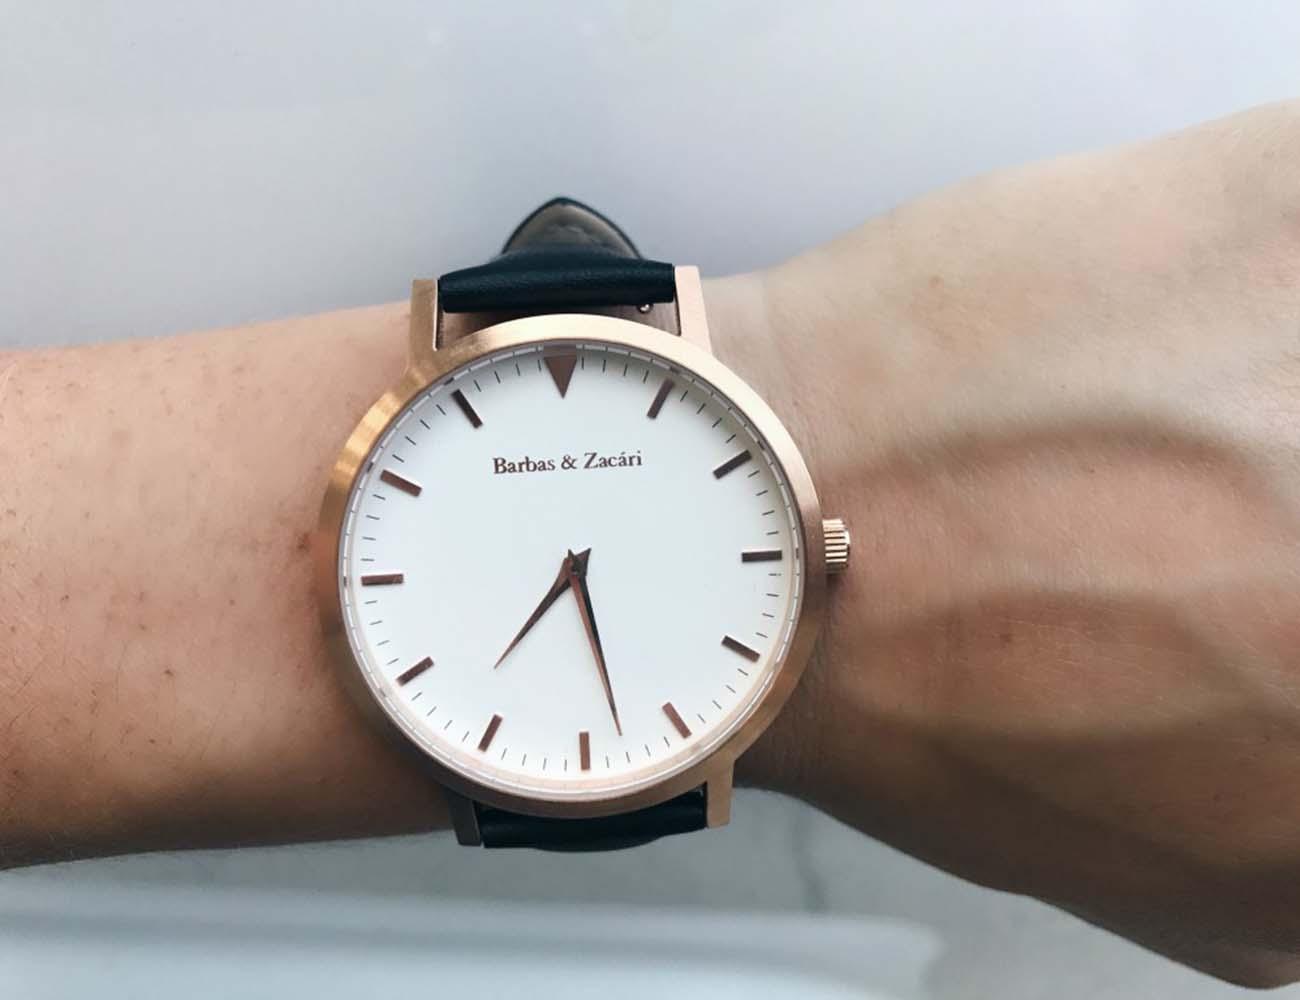 Barbas+%26amp%3B+Zacari+Watches